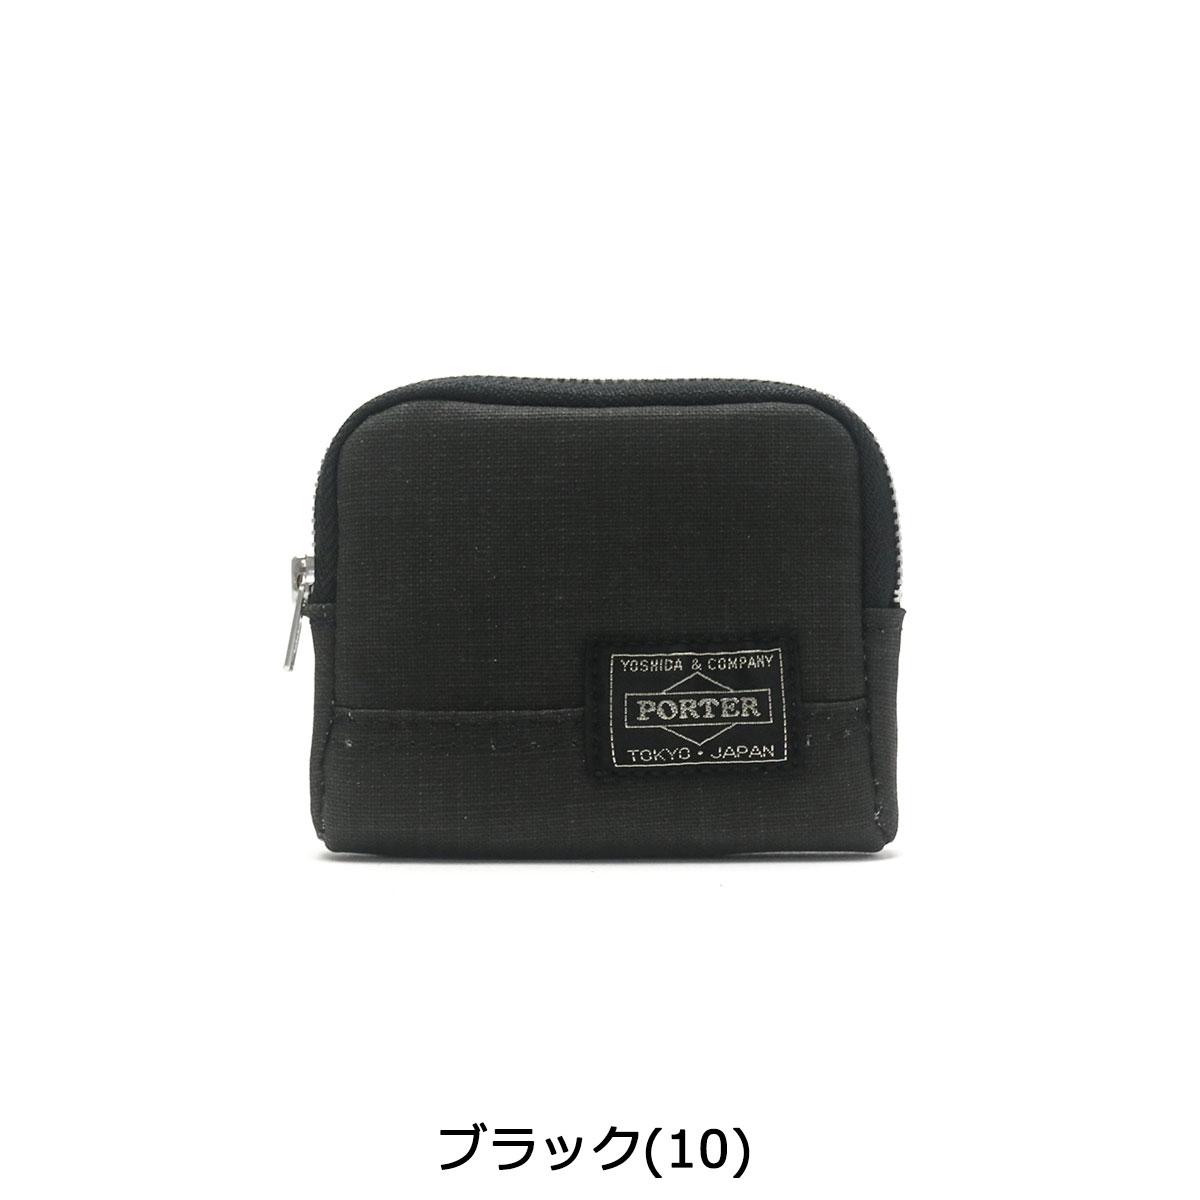 YOSHIDA PORTER DUCK COIN CASE 636-06835 Navy Free Shipping w//Tracking# New Japan